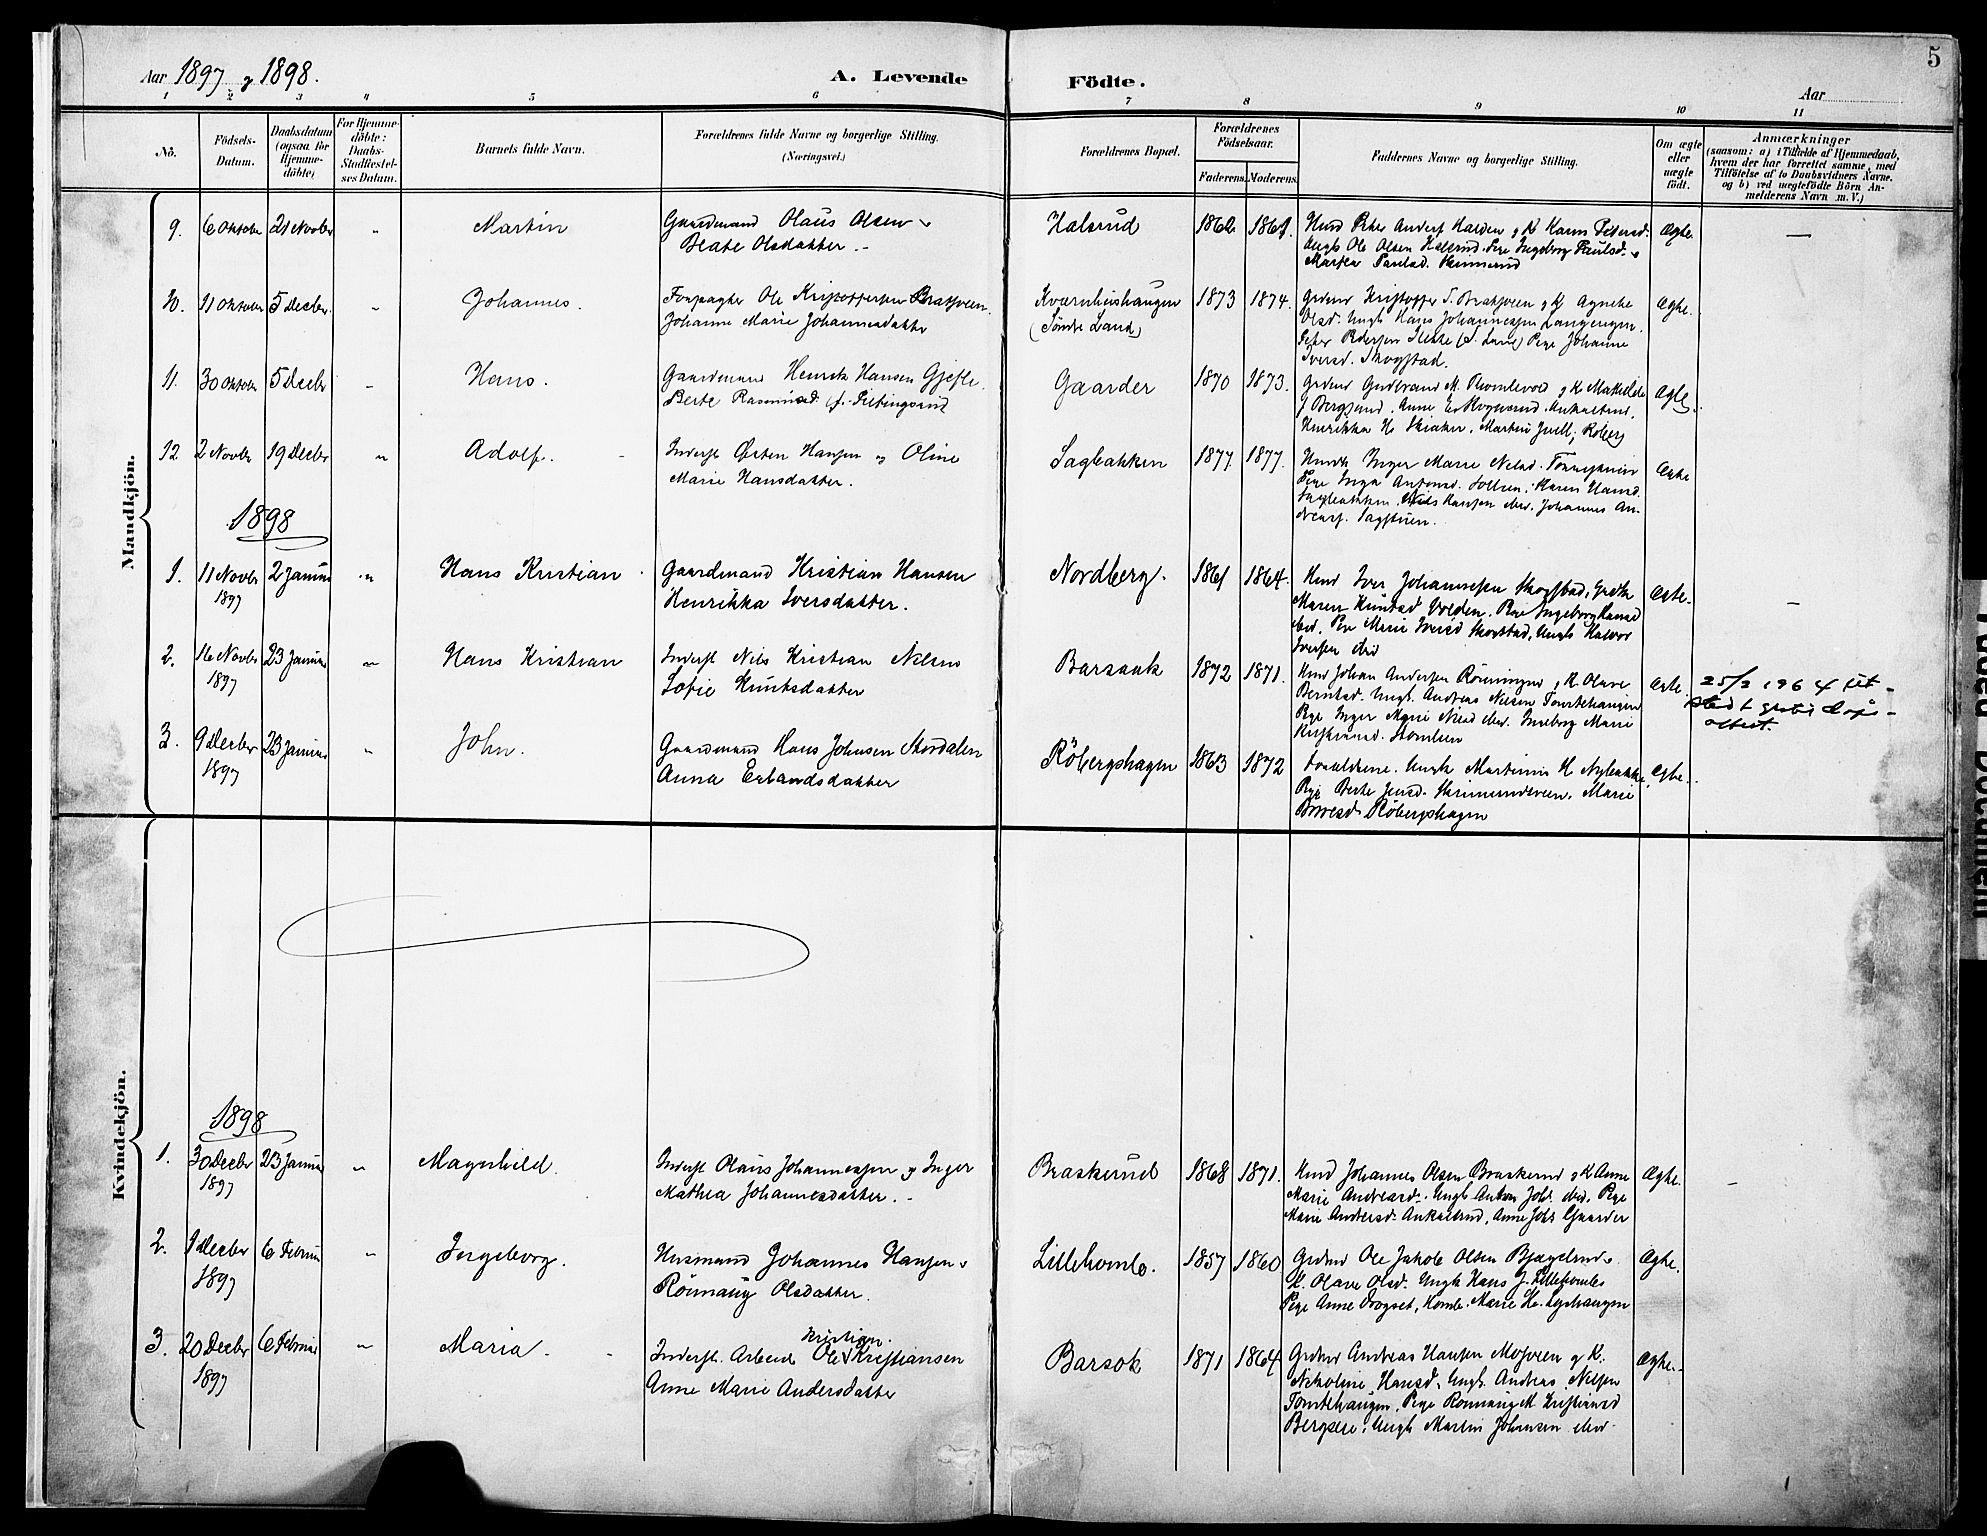 SAH, Nordre Land prestekontor, Ministerialbok nr. 6, 1897-1914, s. 5